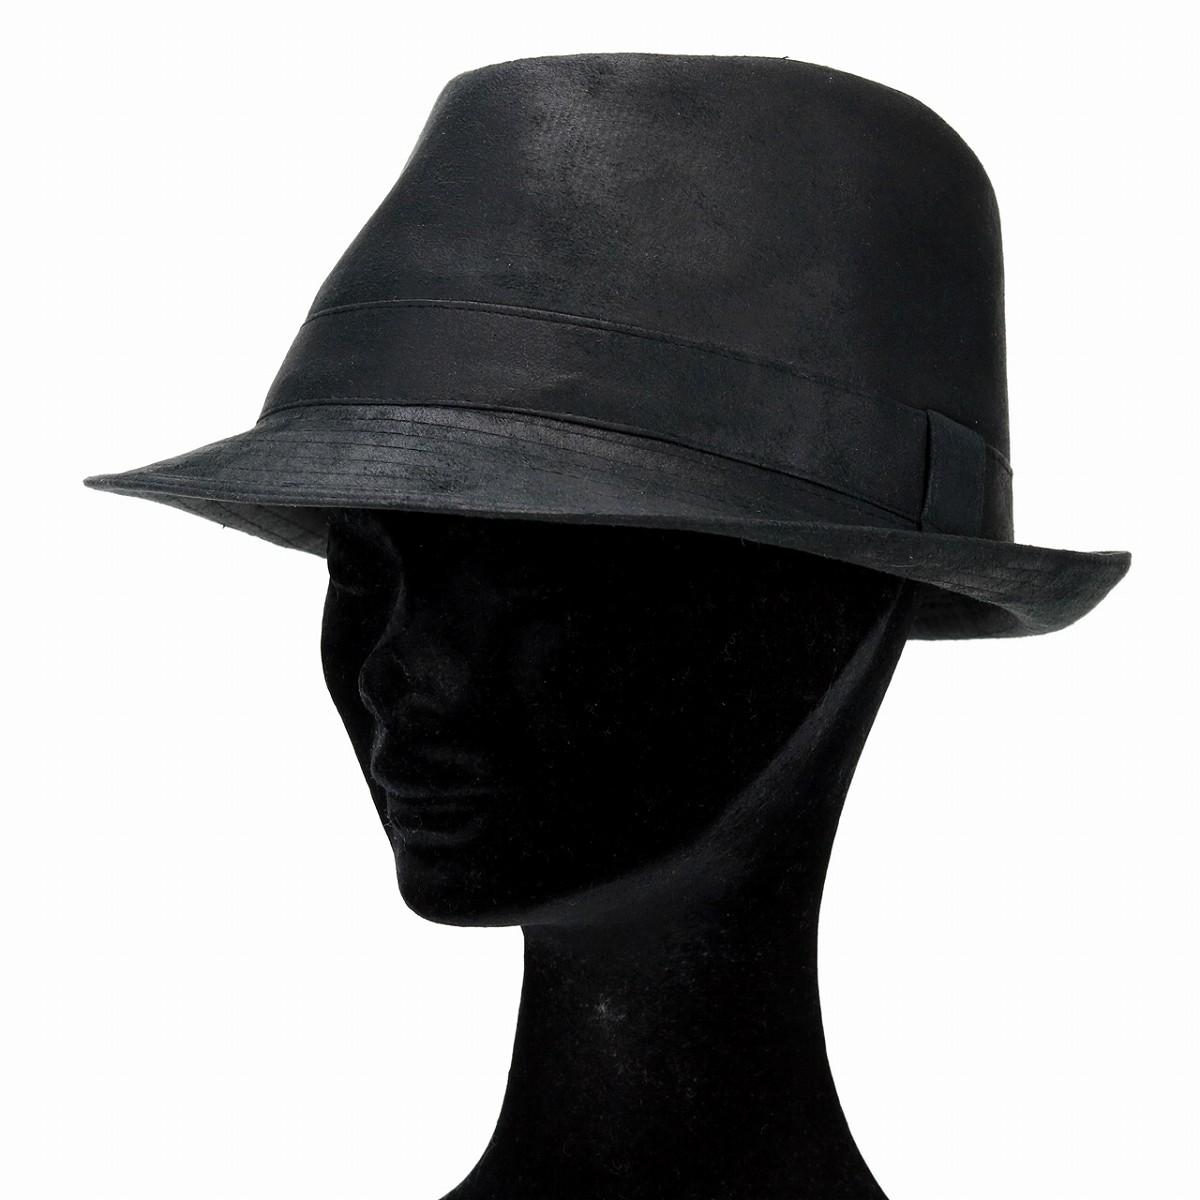 0705dddeffefd The adult ぼうし   black black  fedora  Christmas present gift that the size M  L XL Shin pull soft felt hat hat which Dobbs hat men fake leather hat DOBBS  ...